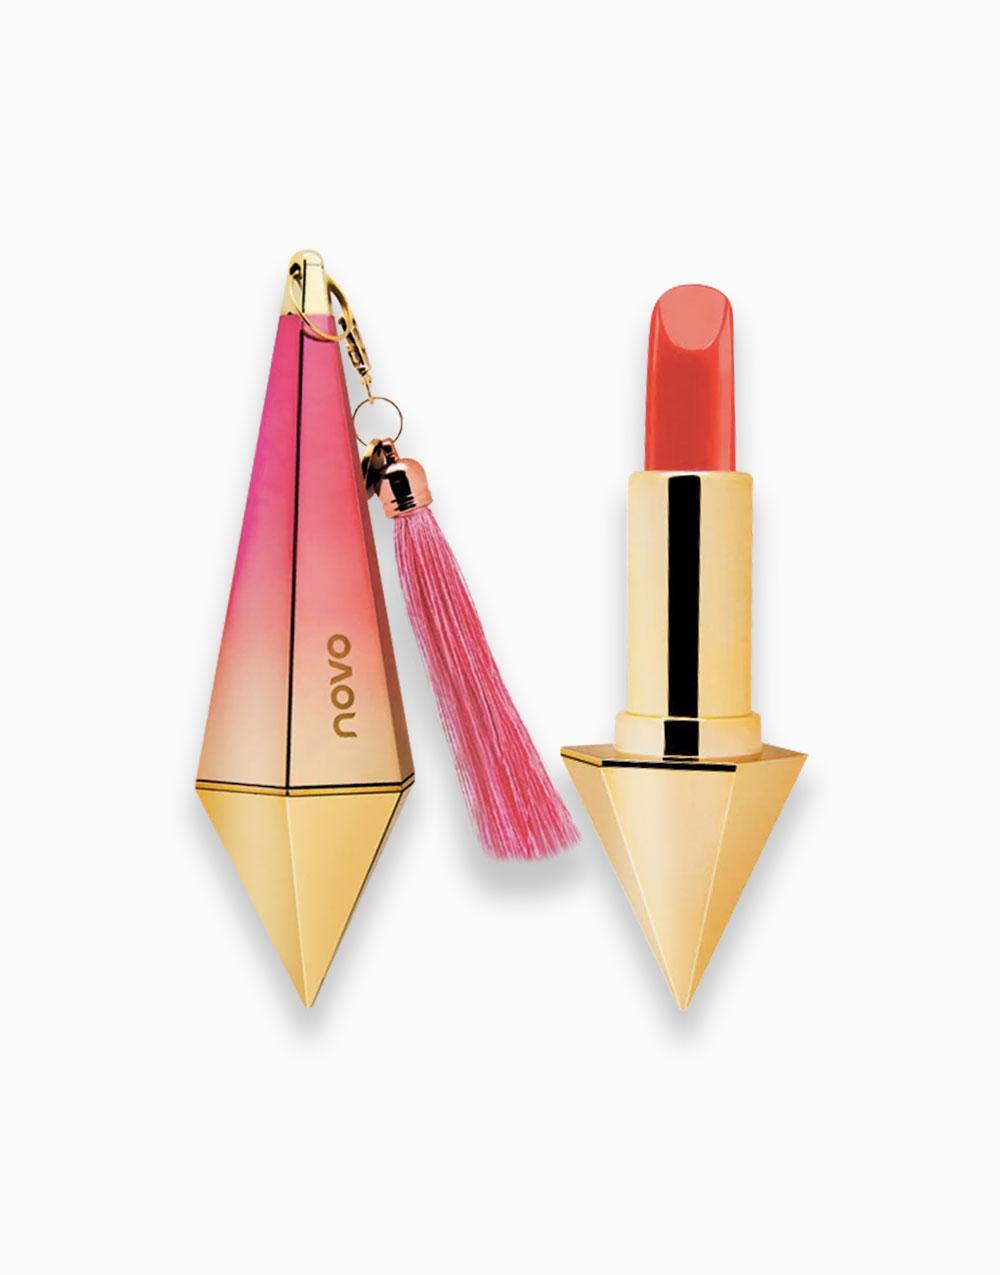 Diamond Lipstick  by Novo Cosmetics  